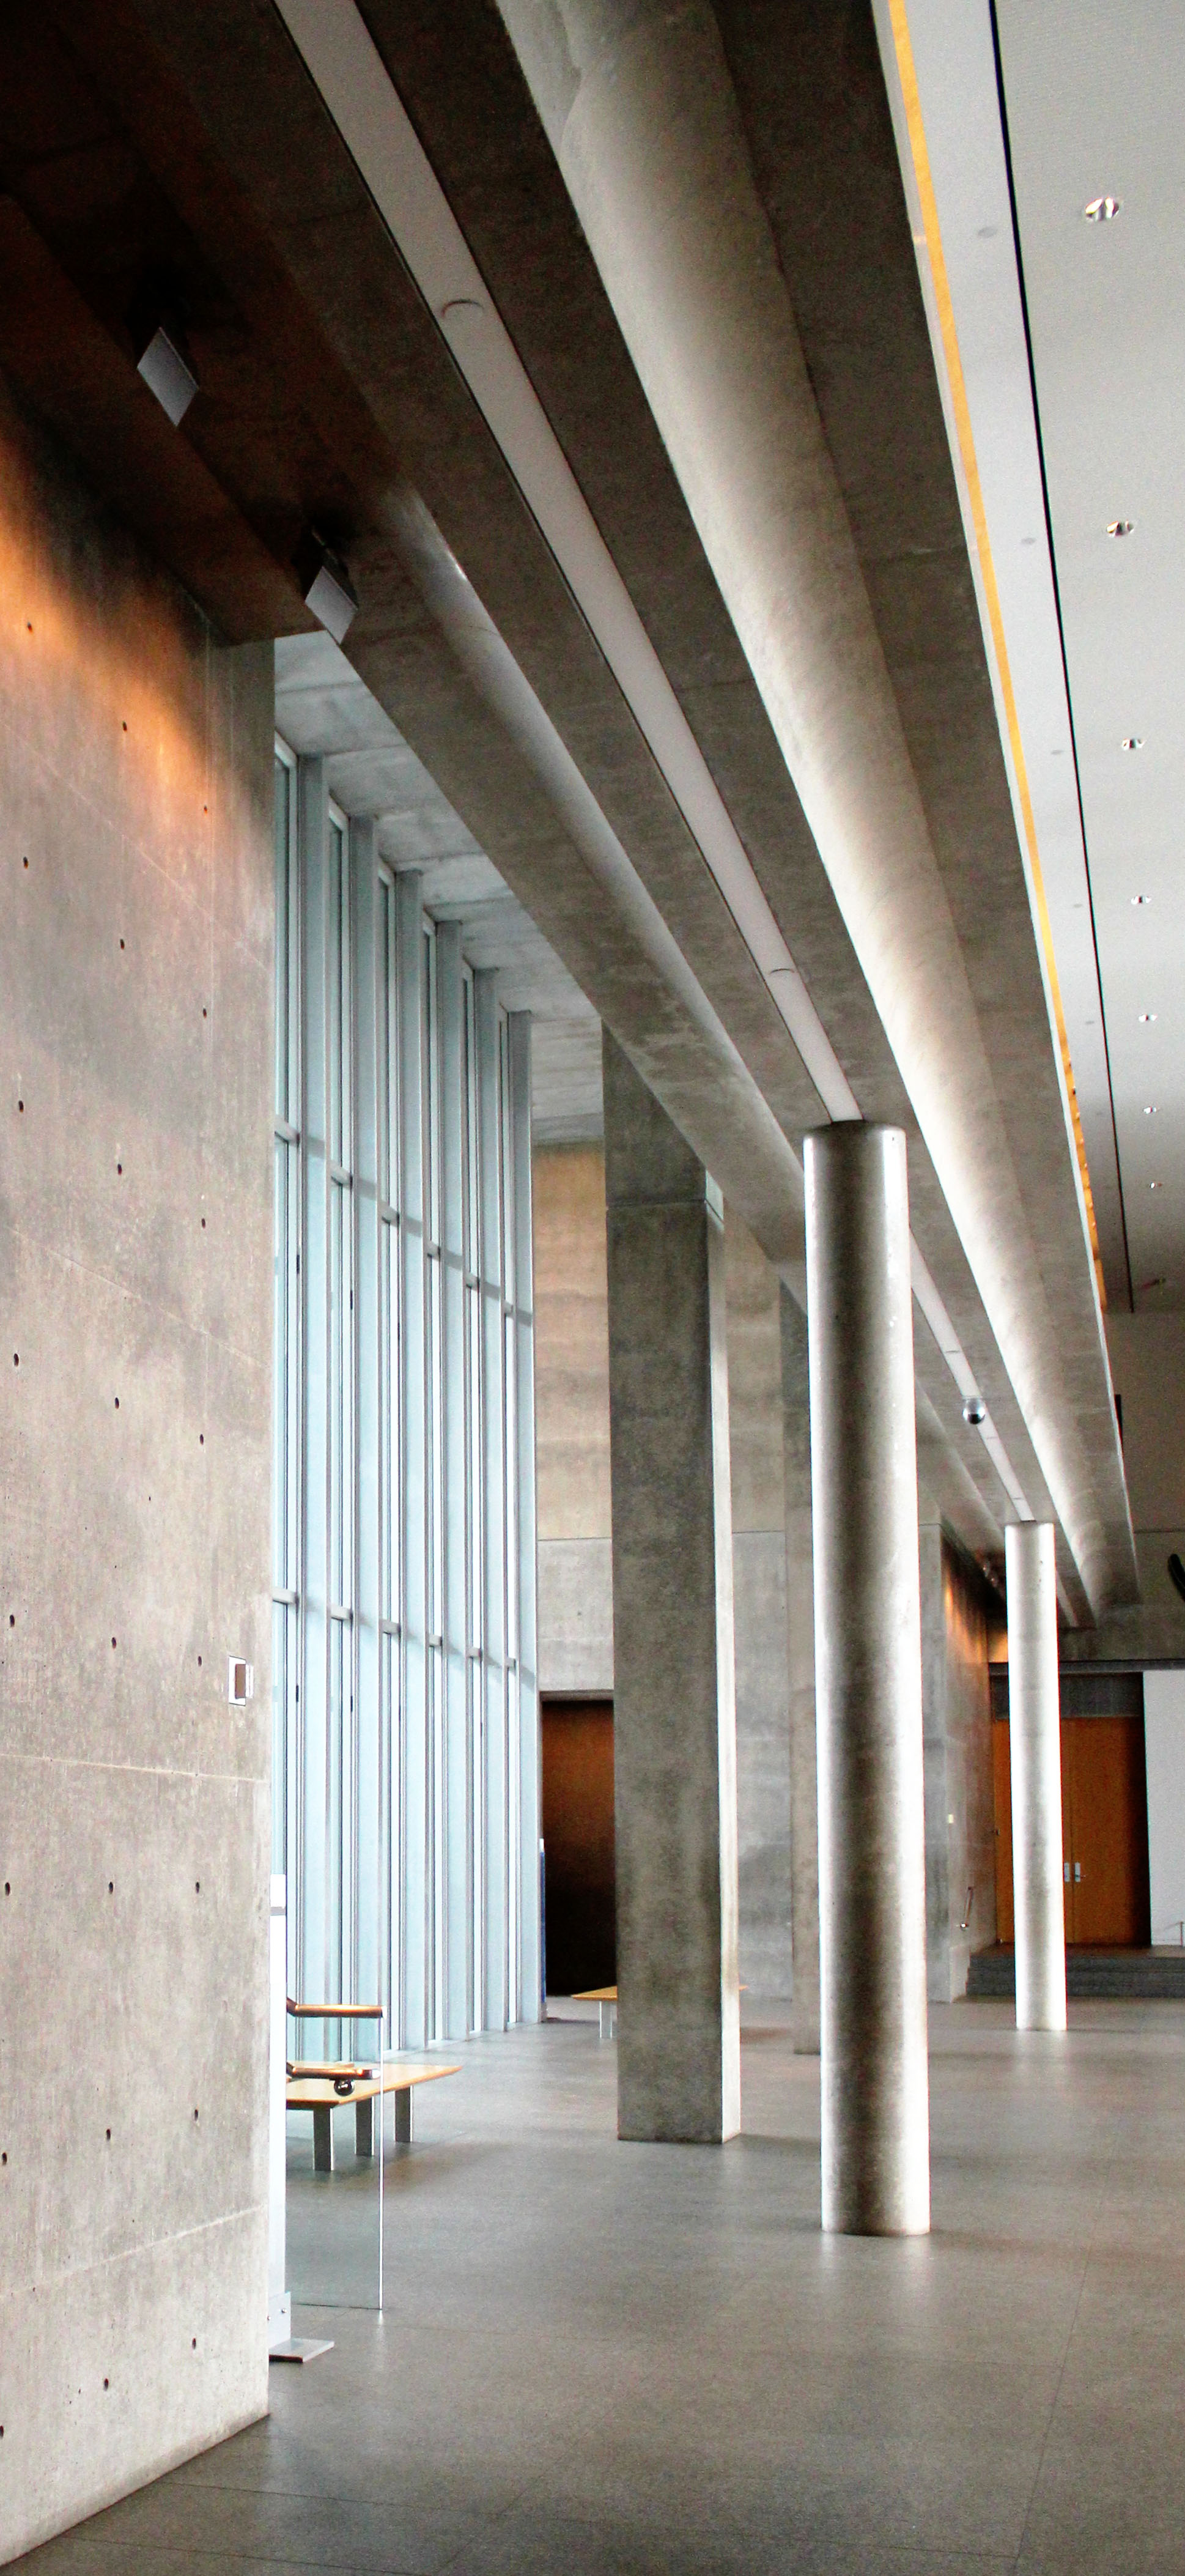 MoMA, Fort Worth - Photo Essay by Amit Khanna (4).JPG